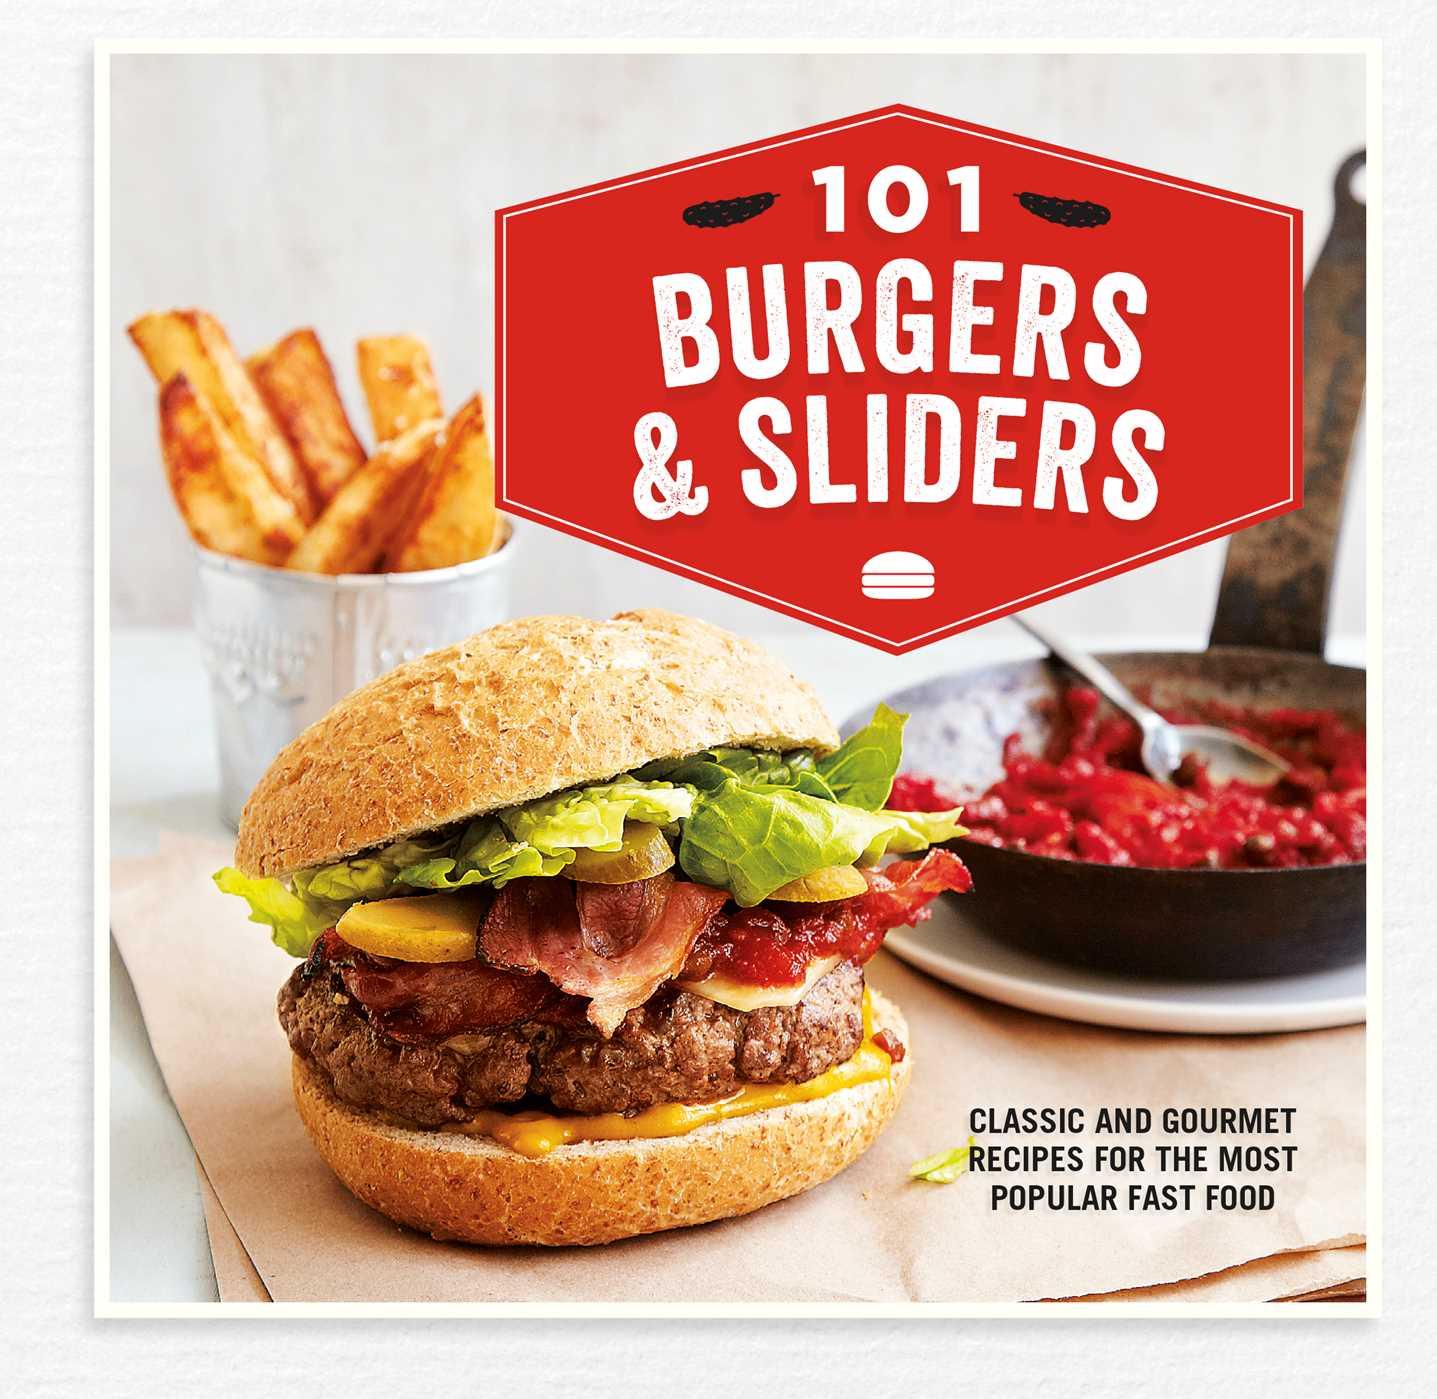 101 burgers sliders 9781849758550 hr